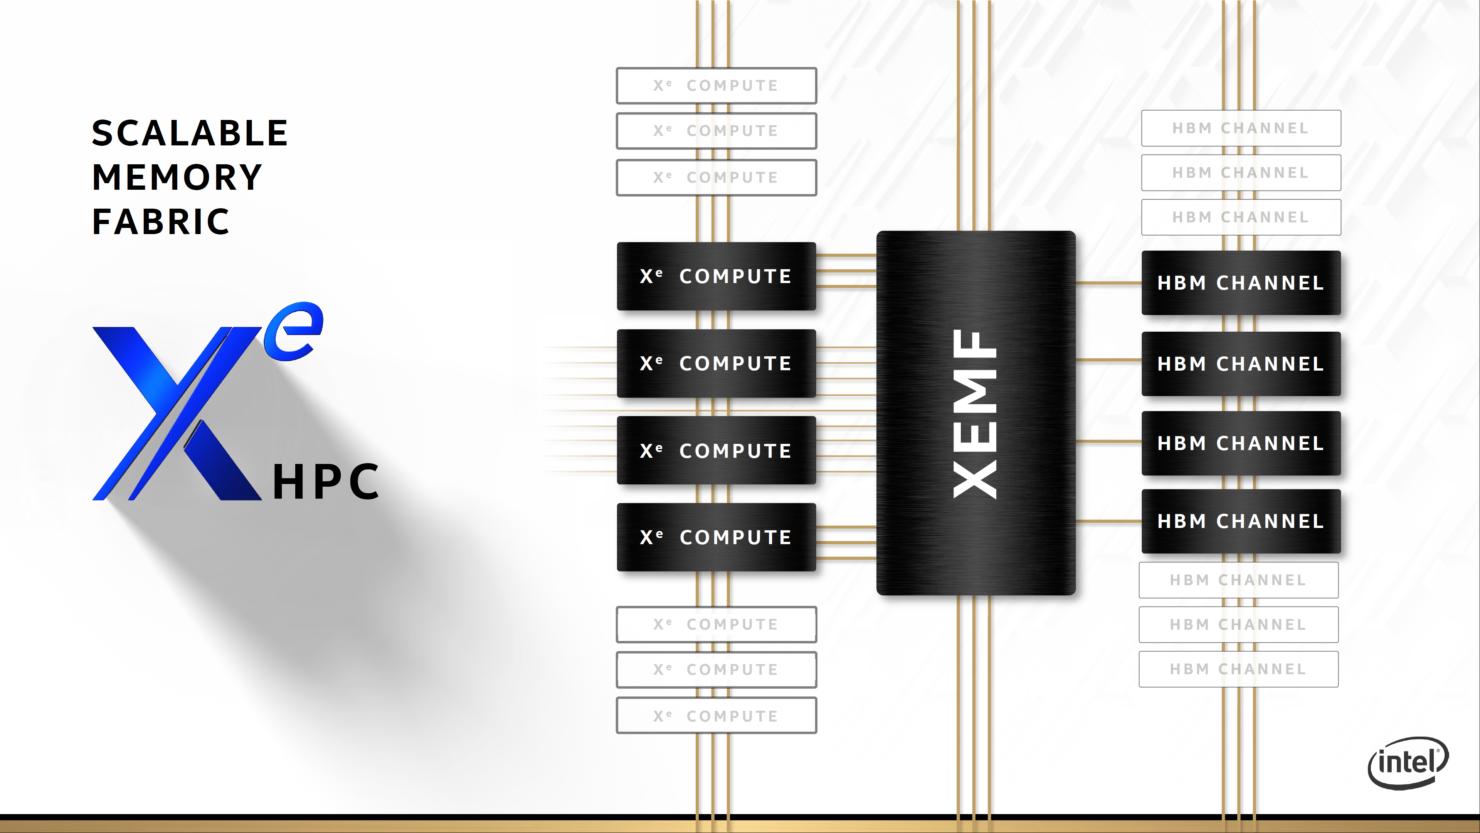 intel-xe-hpc-gpu_ponte-vecchio_architecture_raja-koduri_18